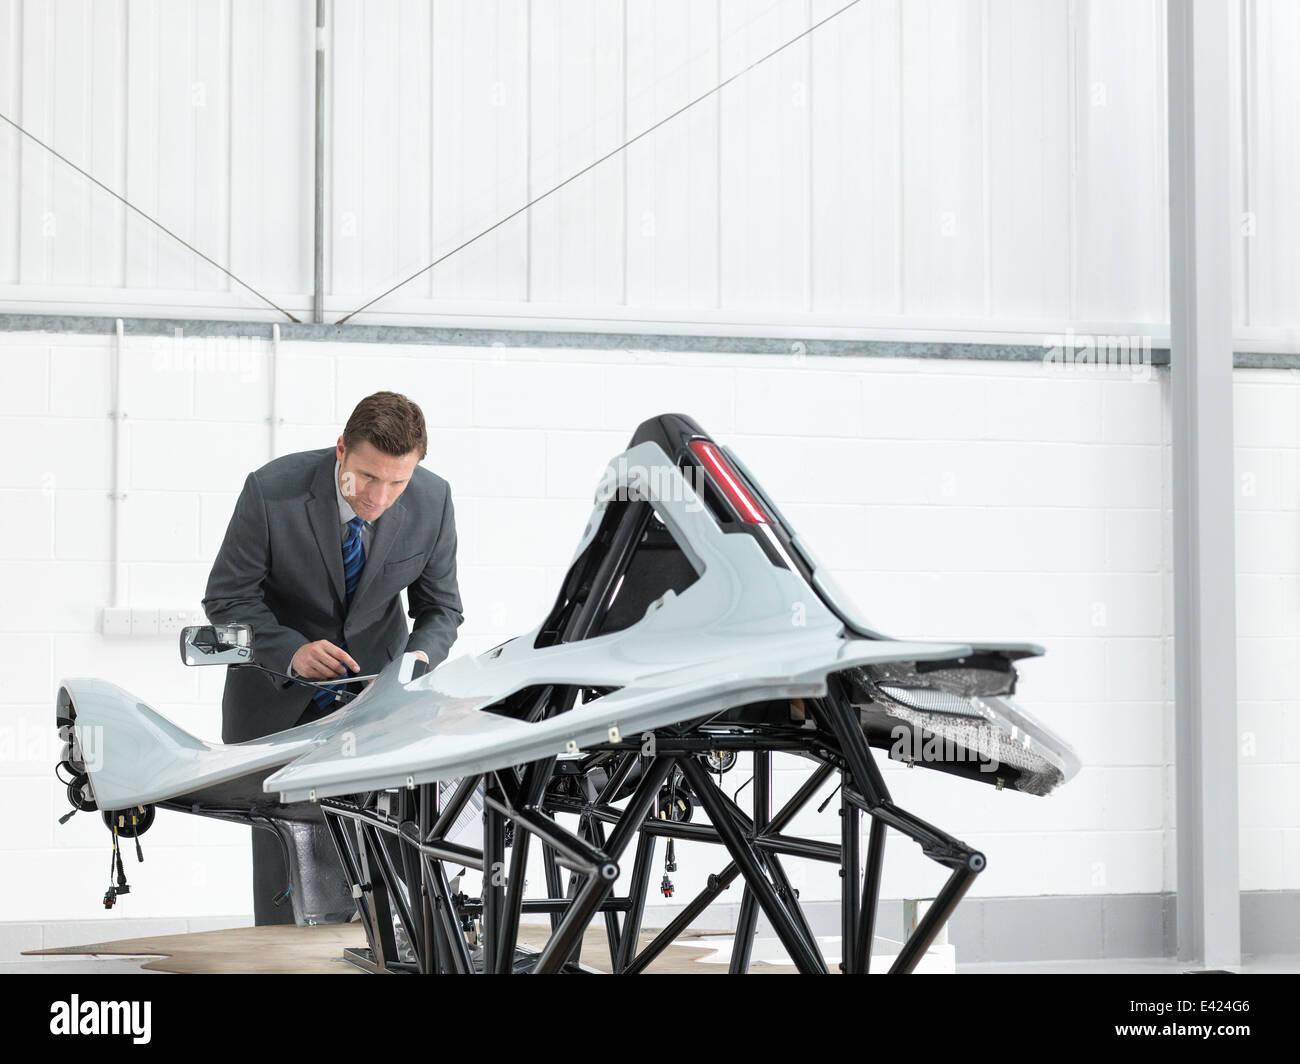 Automotive designer inspecting part-built supercar in car factory - Stock Image